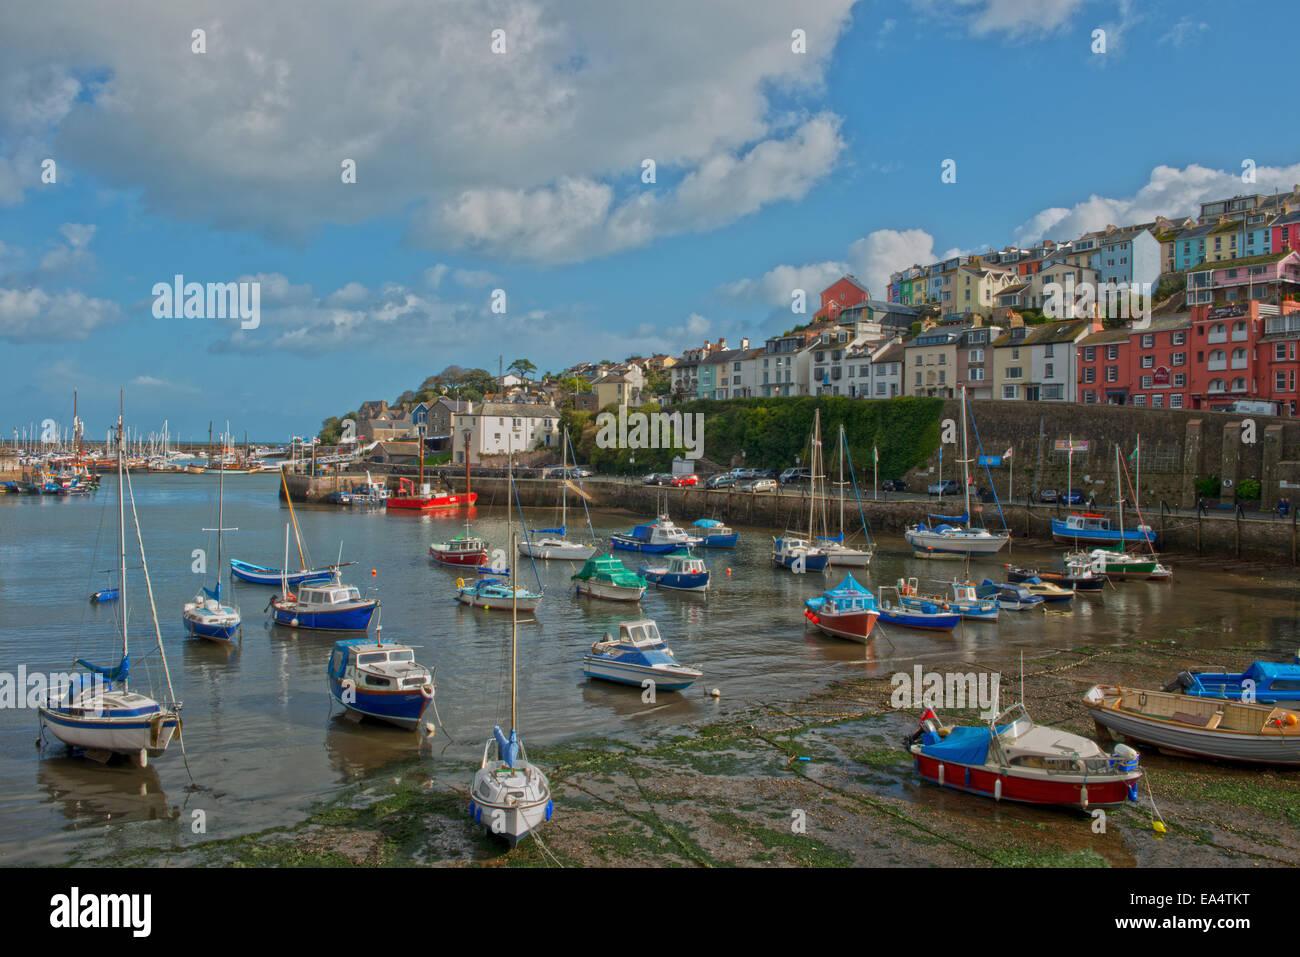 Brixham Harbour,Torbay, Devon, South-West  England, Uk. - Stock Image